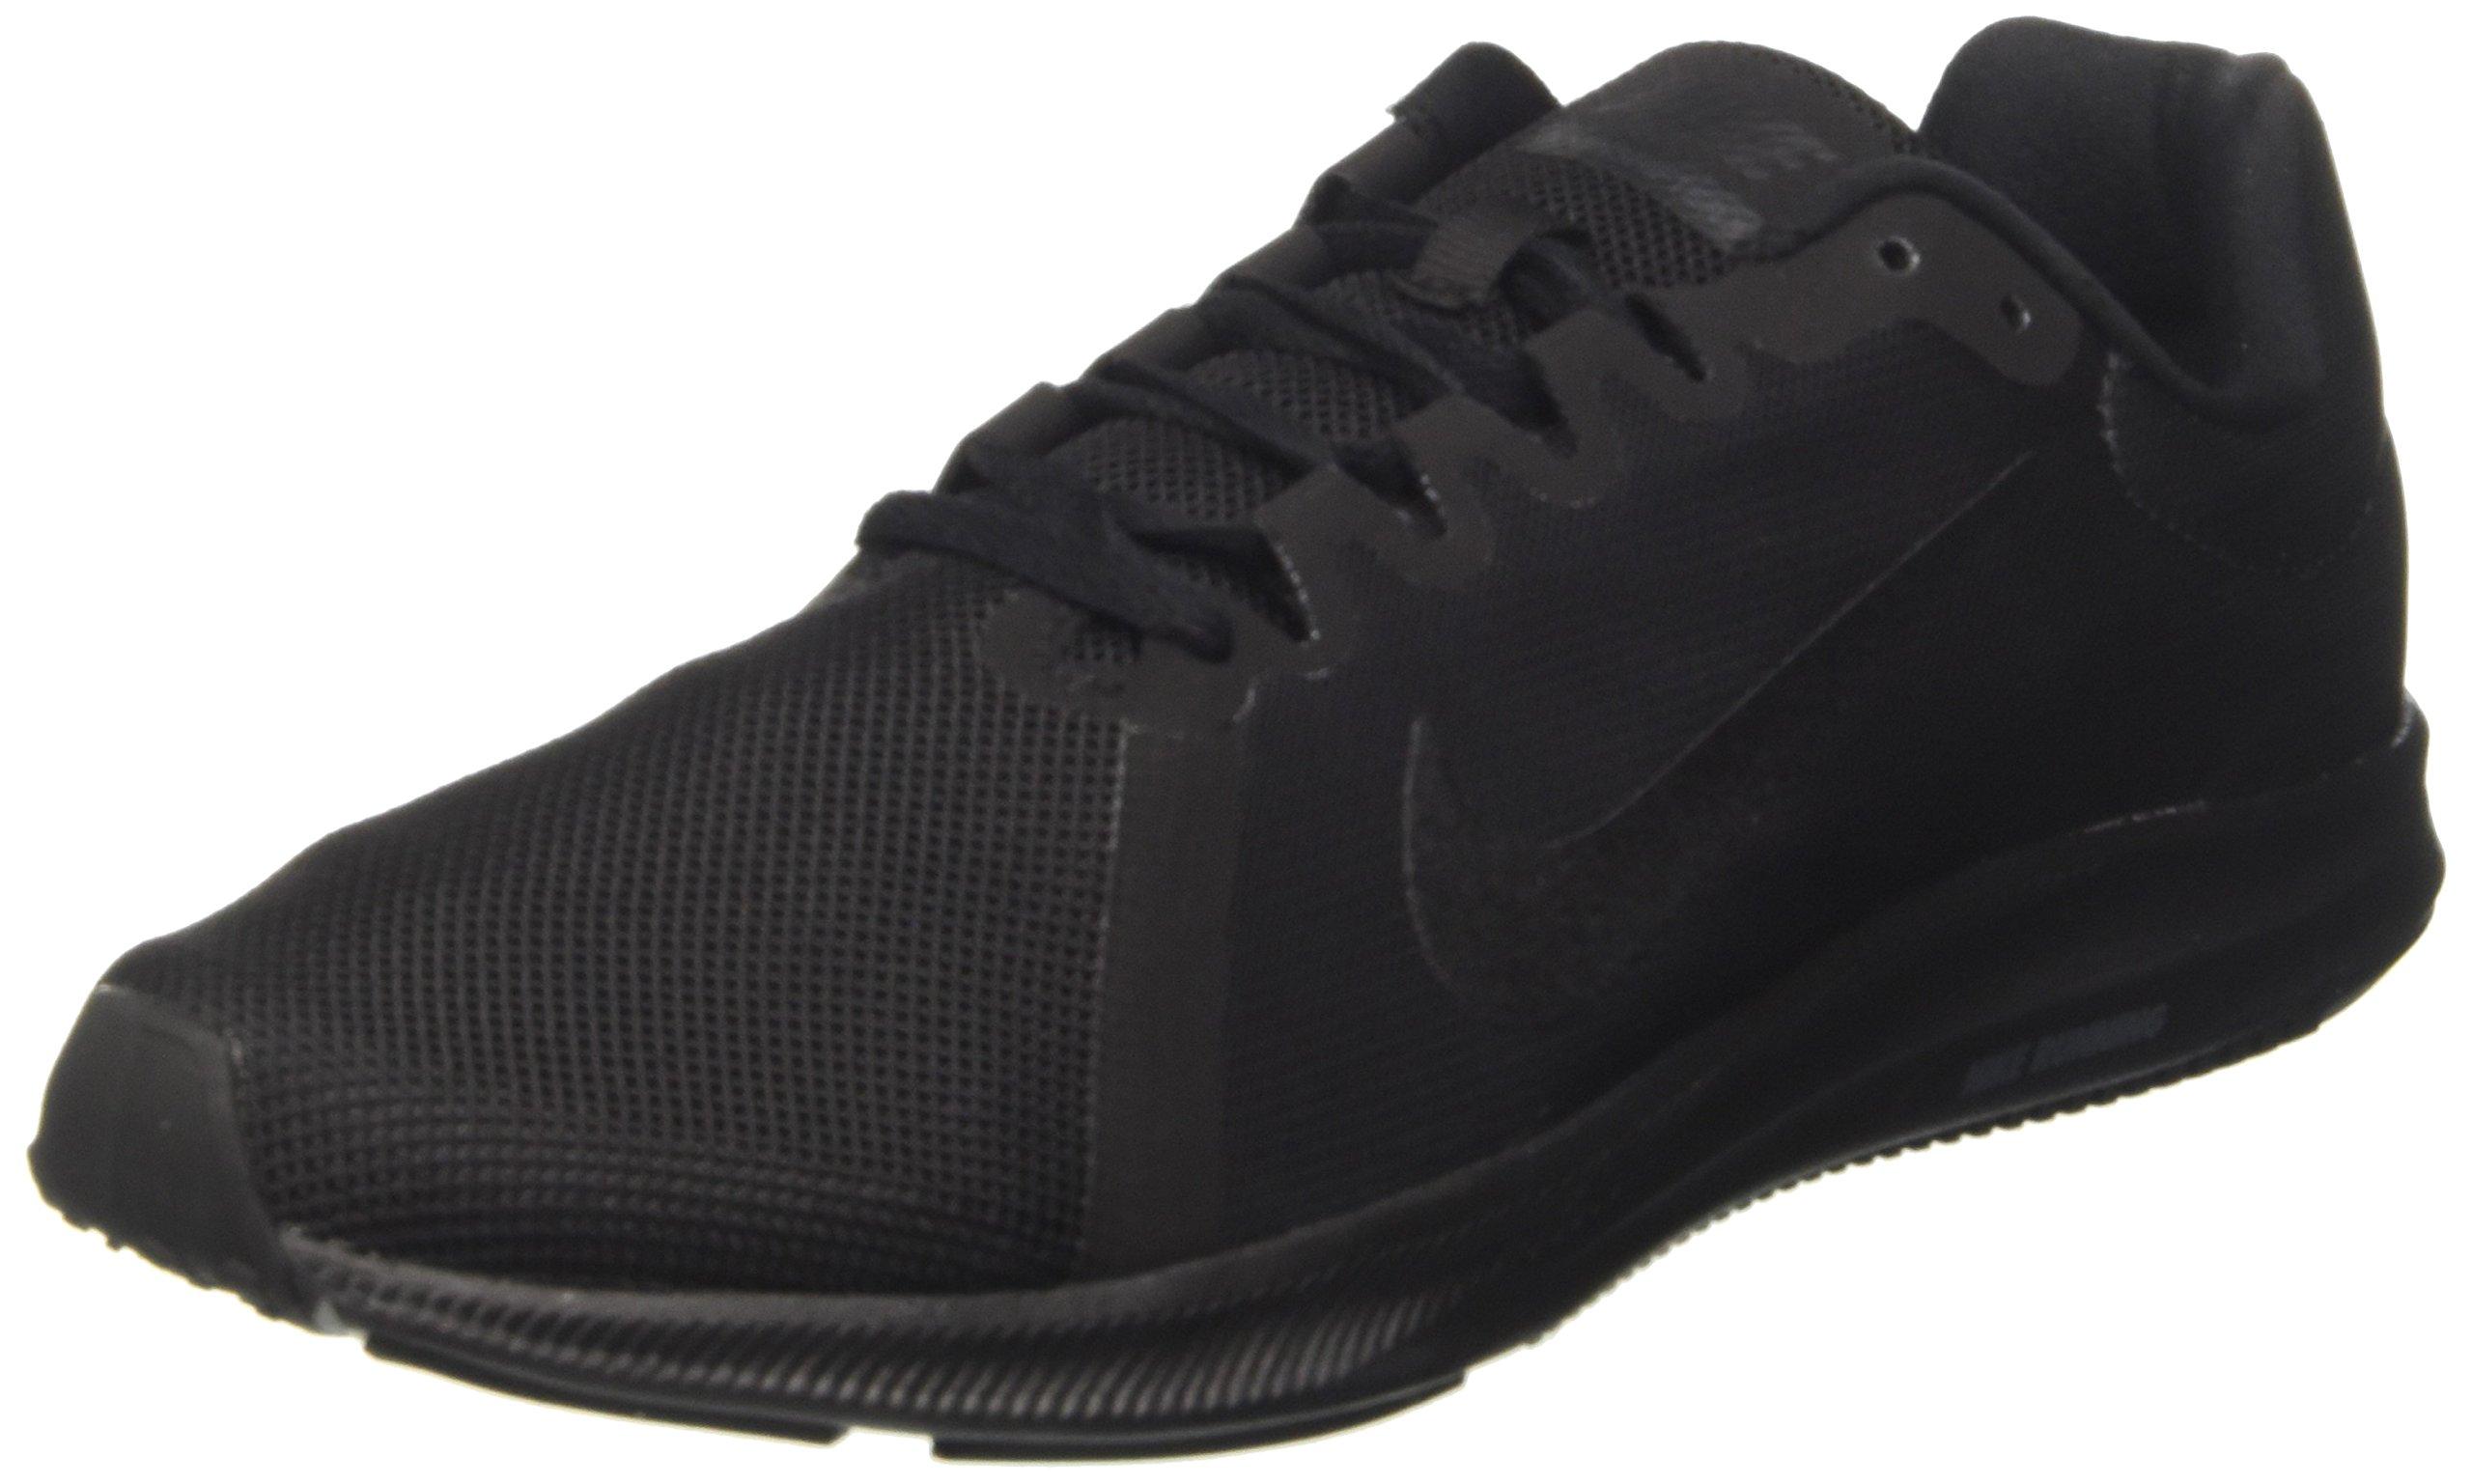 Nike Men's Downshifter 8 Running Shoe, Black/Black, 7.5